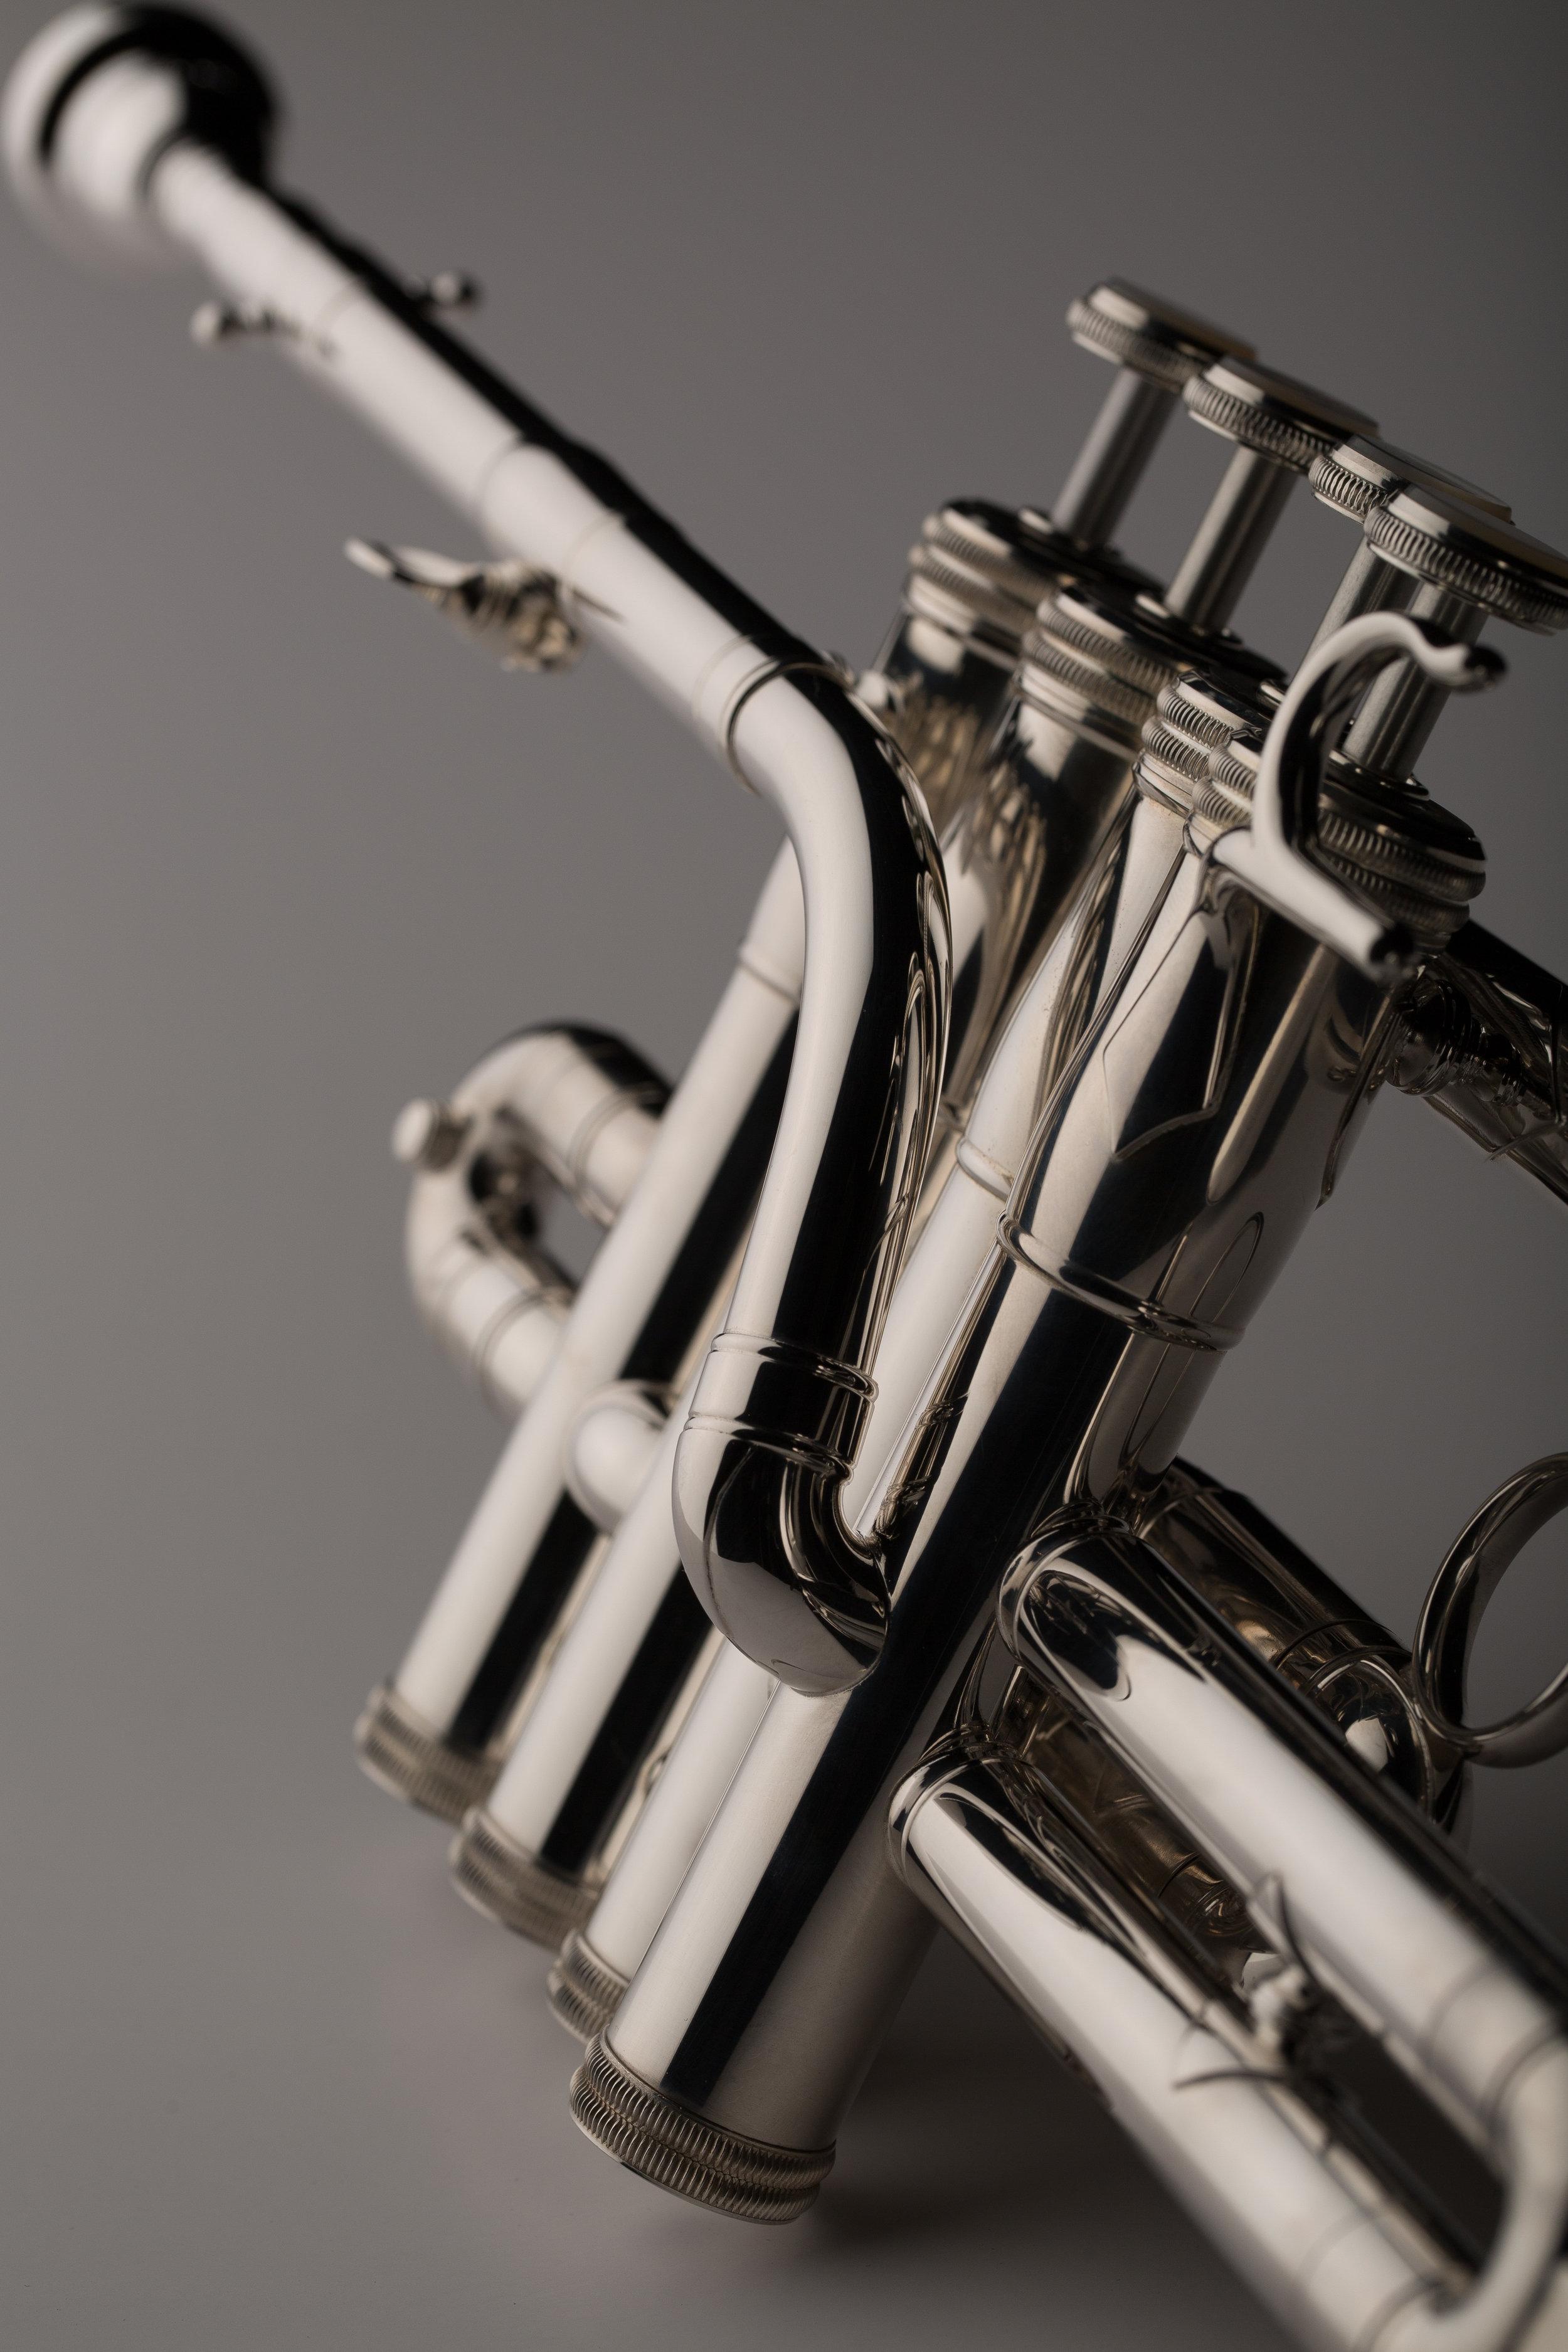 Shires_Trumpet_Model_92Y_Body_1016.jpg